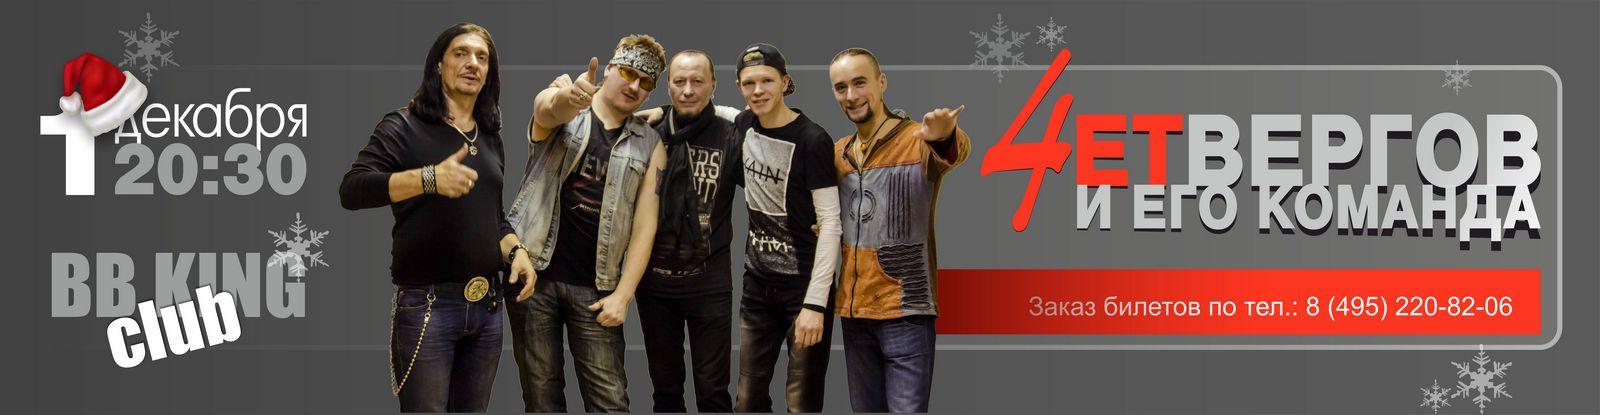 Дмитрий Четвергов гитарист